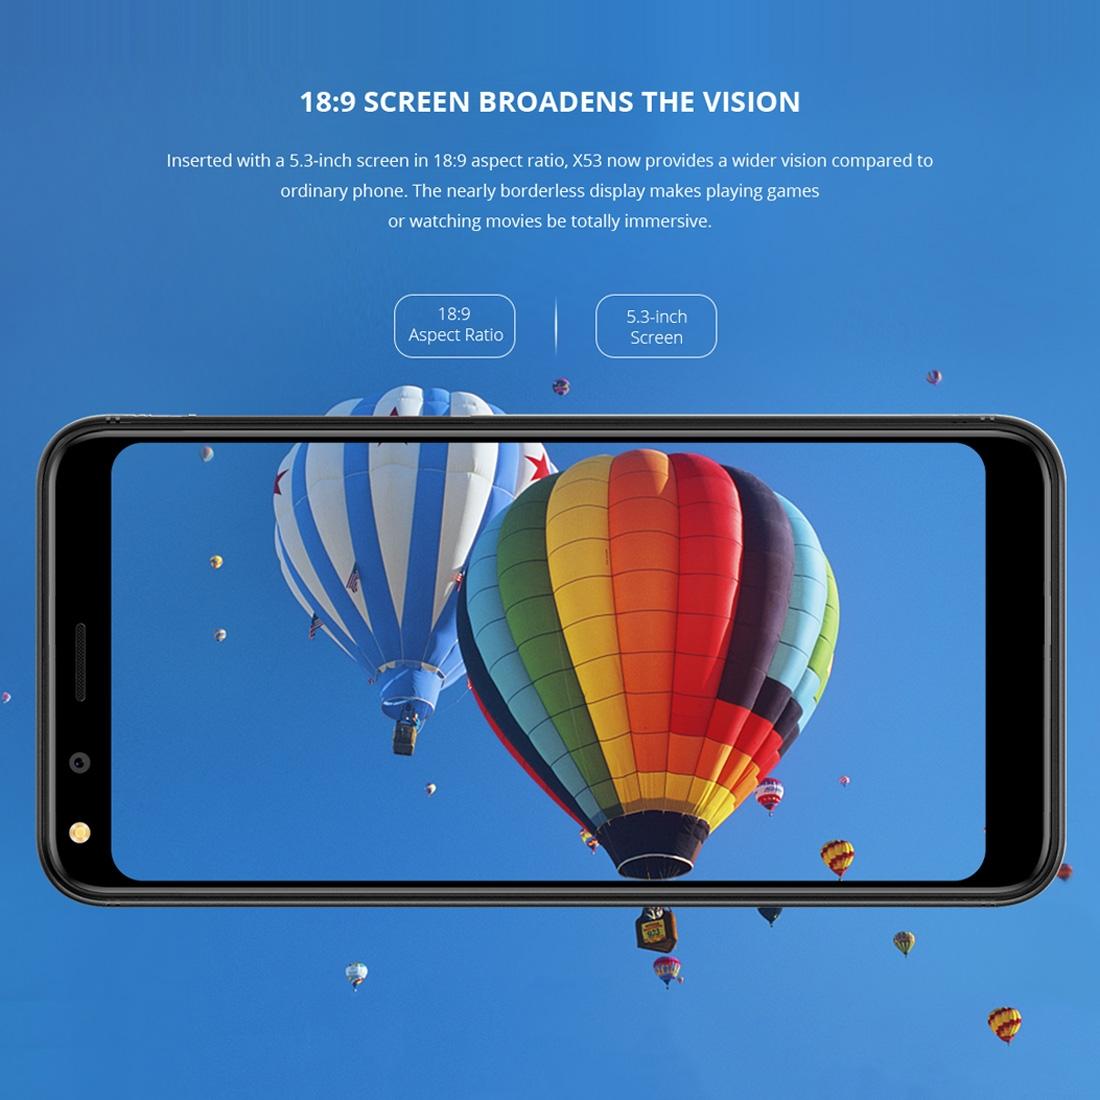 Проектор Смартфон DOOGEE X53 1GB+16GB Двойная задняя камера 5.3 дюйма Android 7.0 MTK6580M 4 ядра до 1.3GHz 3G OTA Две SIM (Серебряный) (Фото 6)